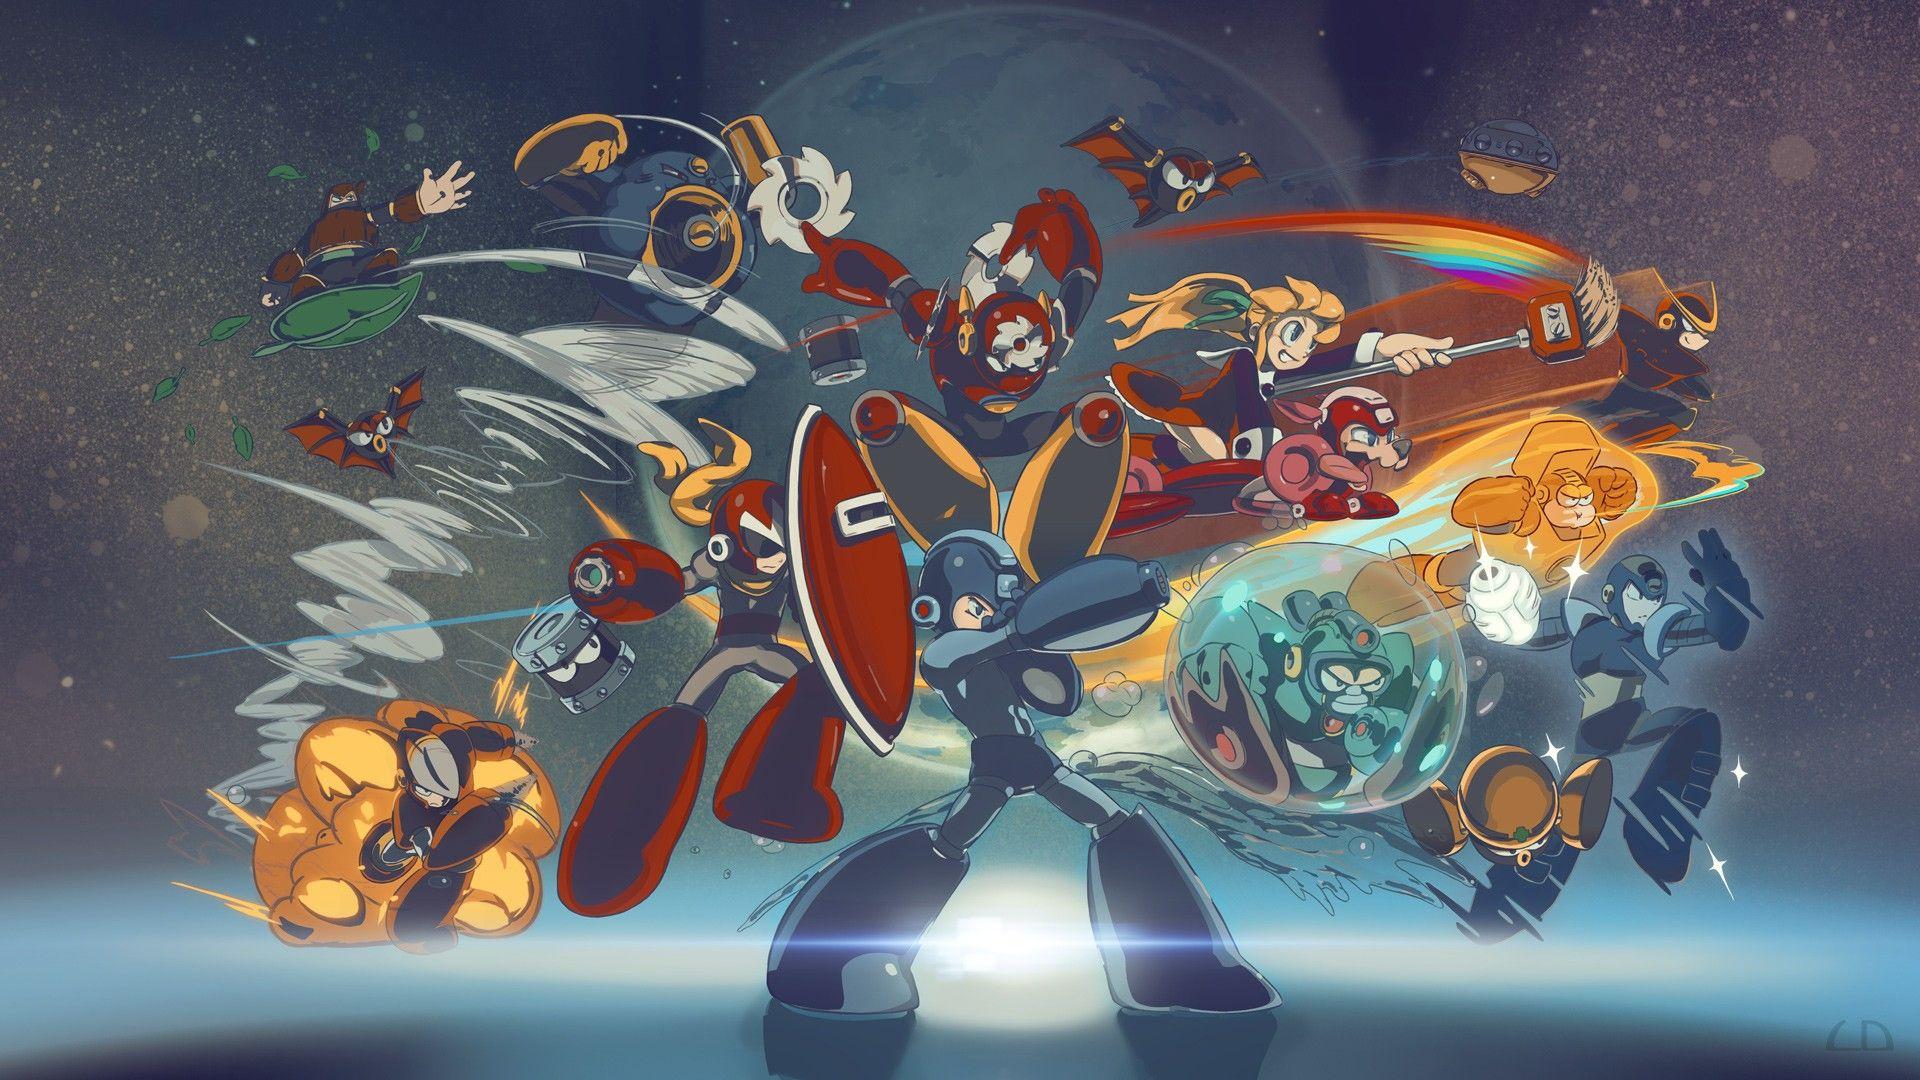 Megaman Wallpaper Hd Free Download Mega Man Art Mega Man Anime